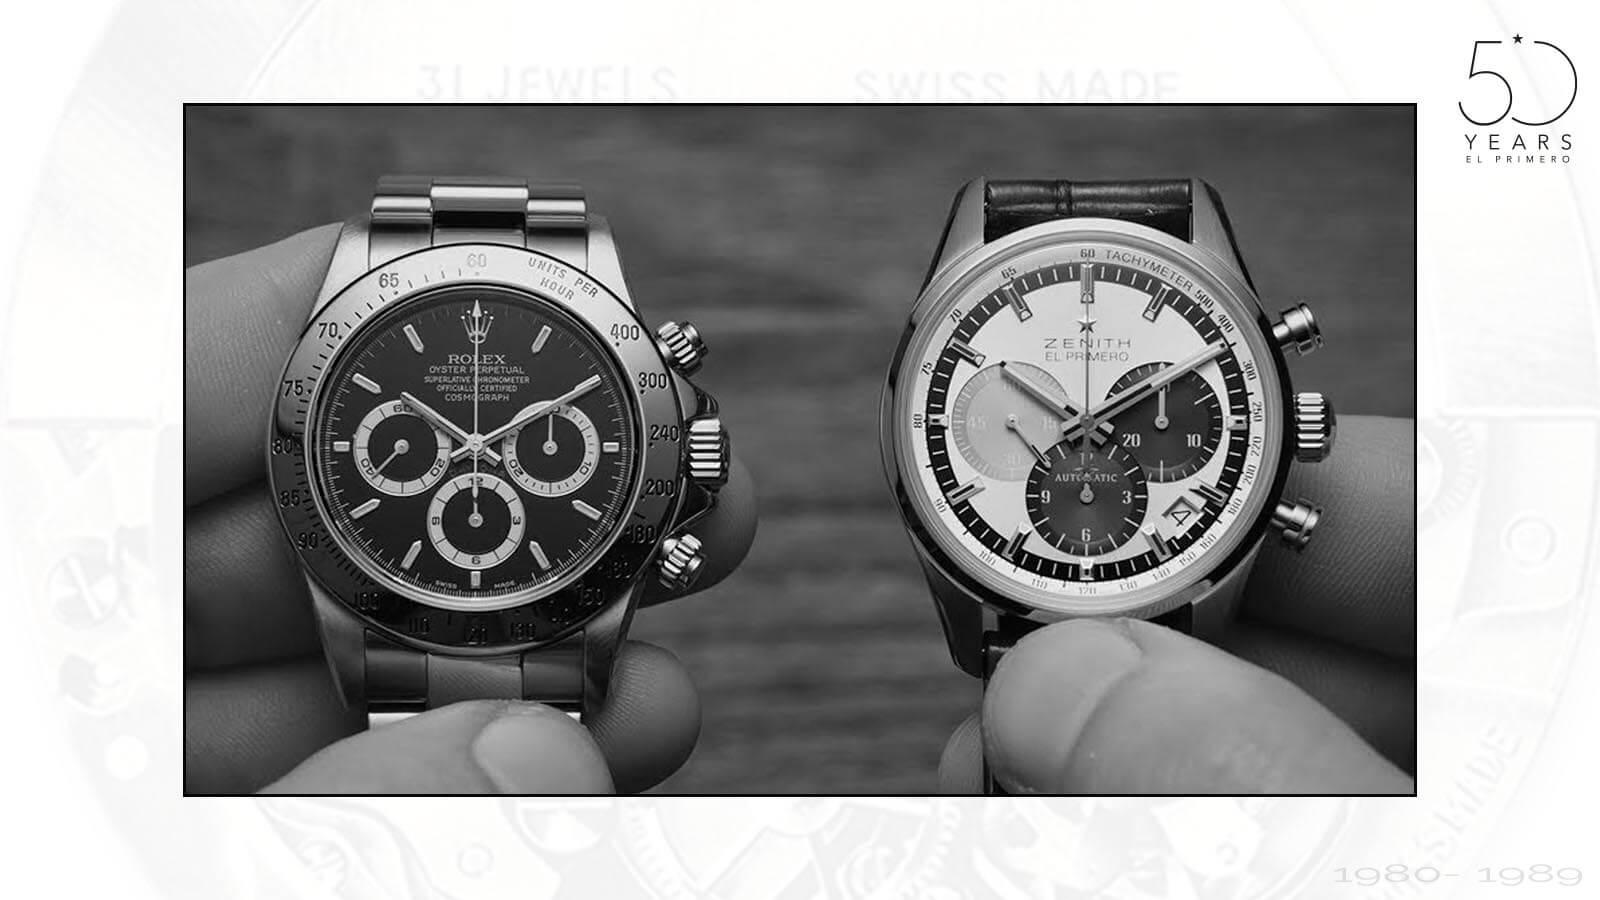 Vergleich Roley Daytona und Zenith El Primero Chronograph